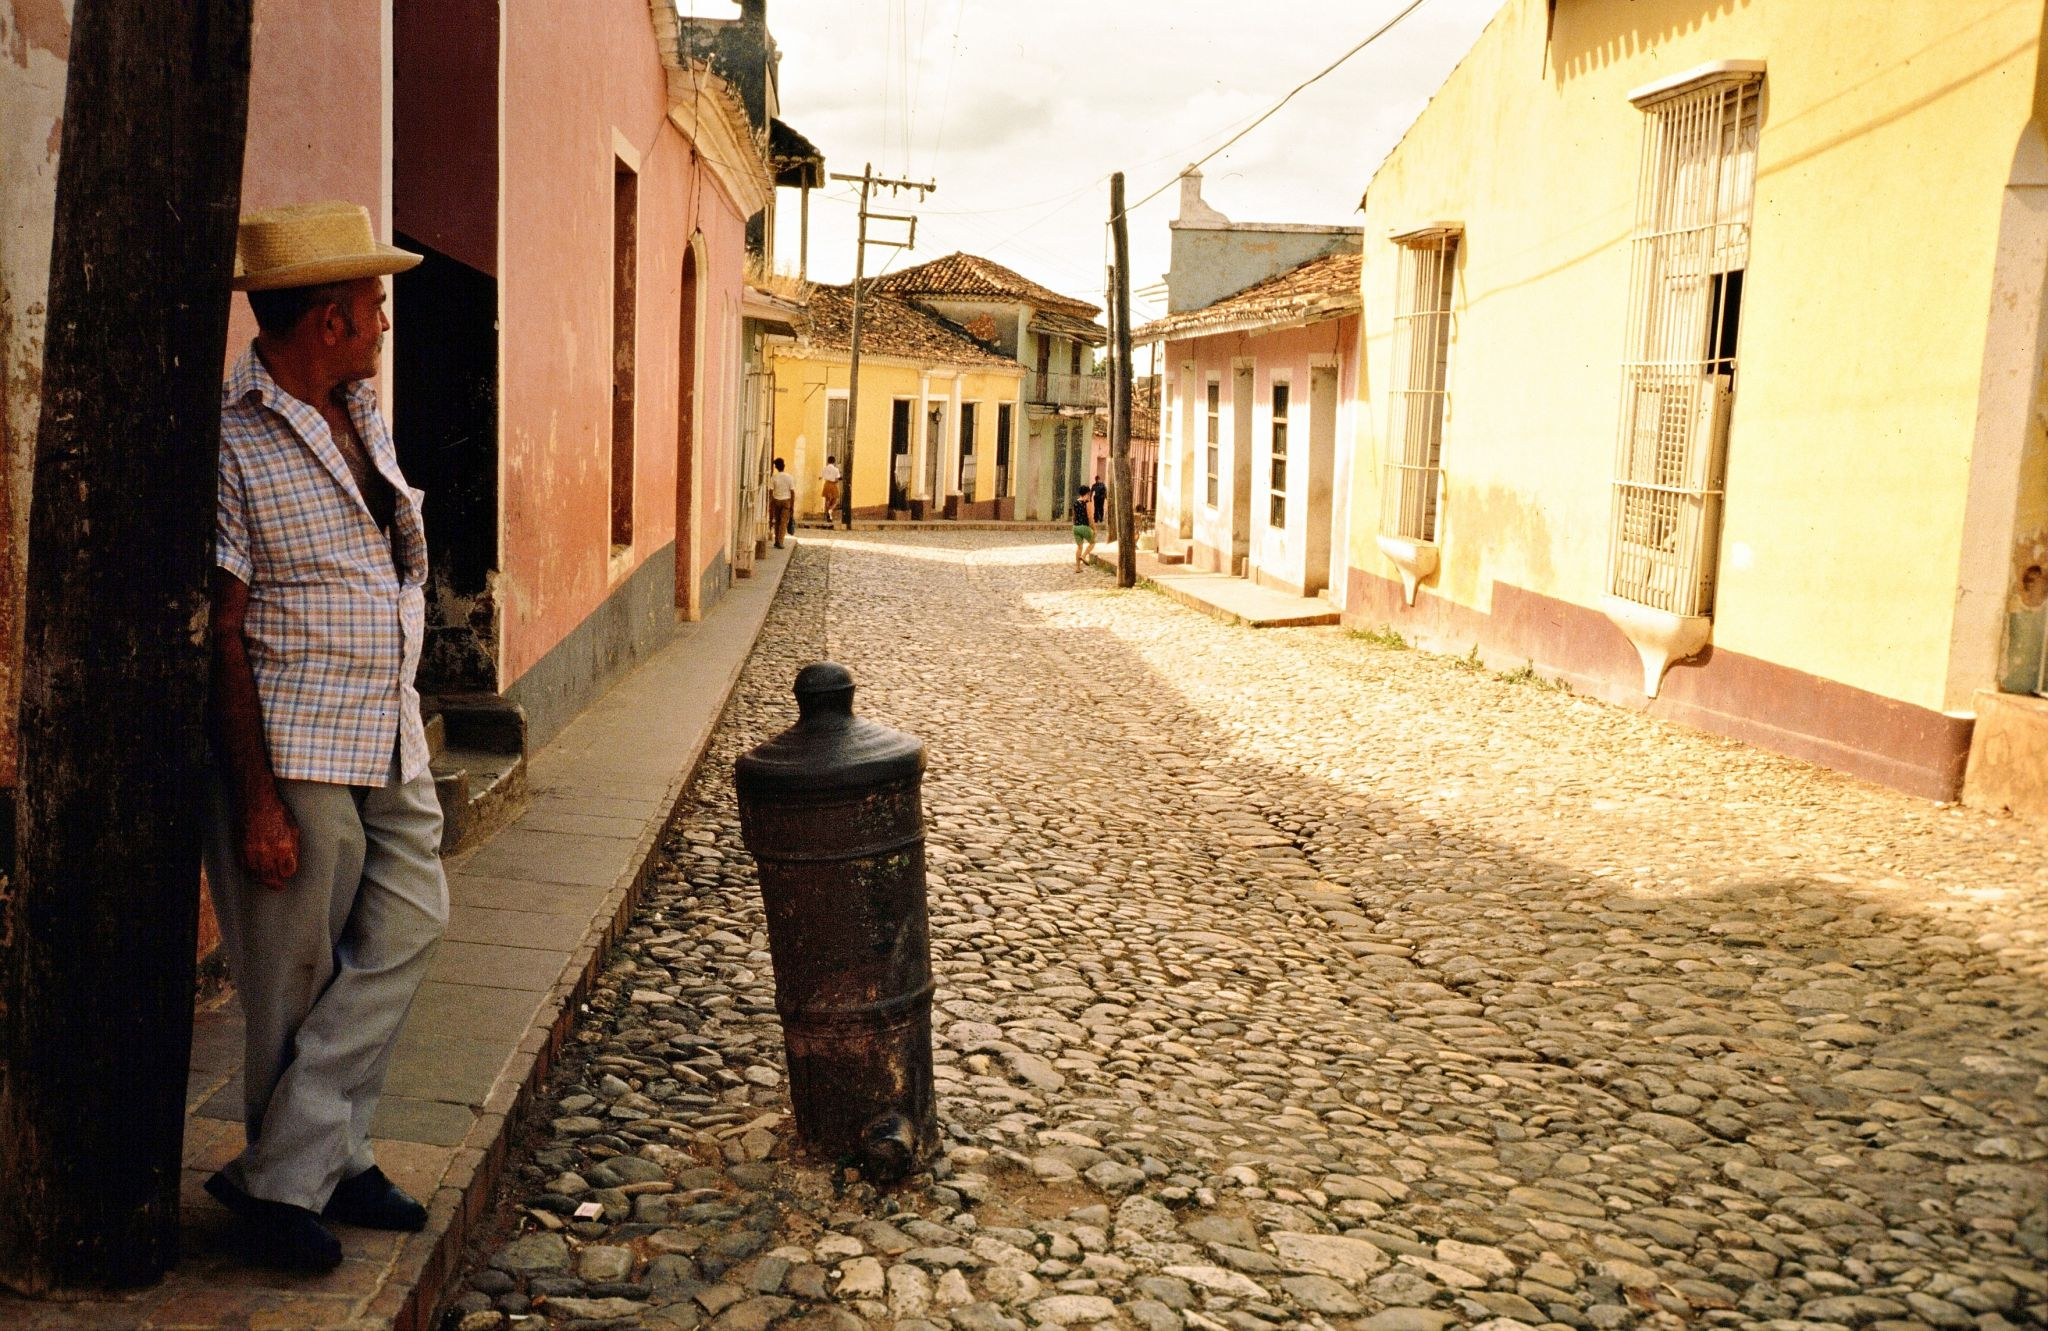 Bollards in the streets of Trinidad, Cuba, Cuba